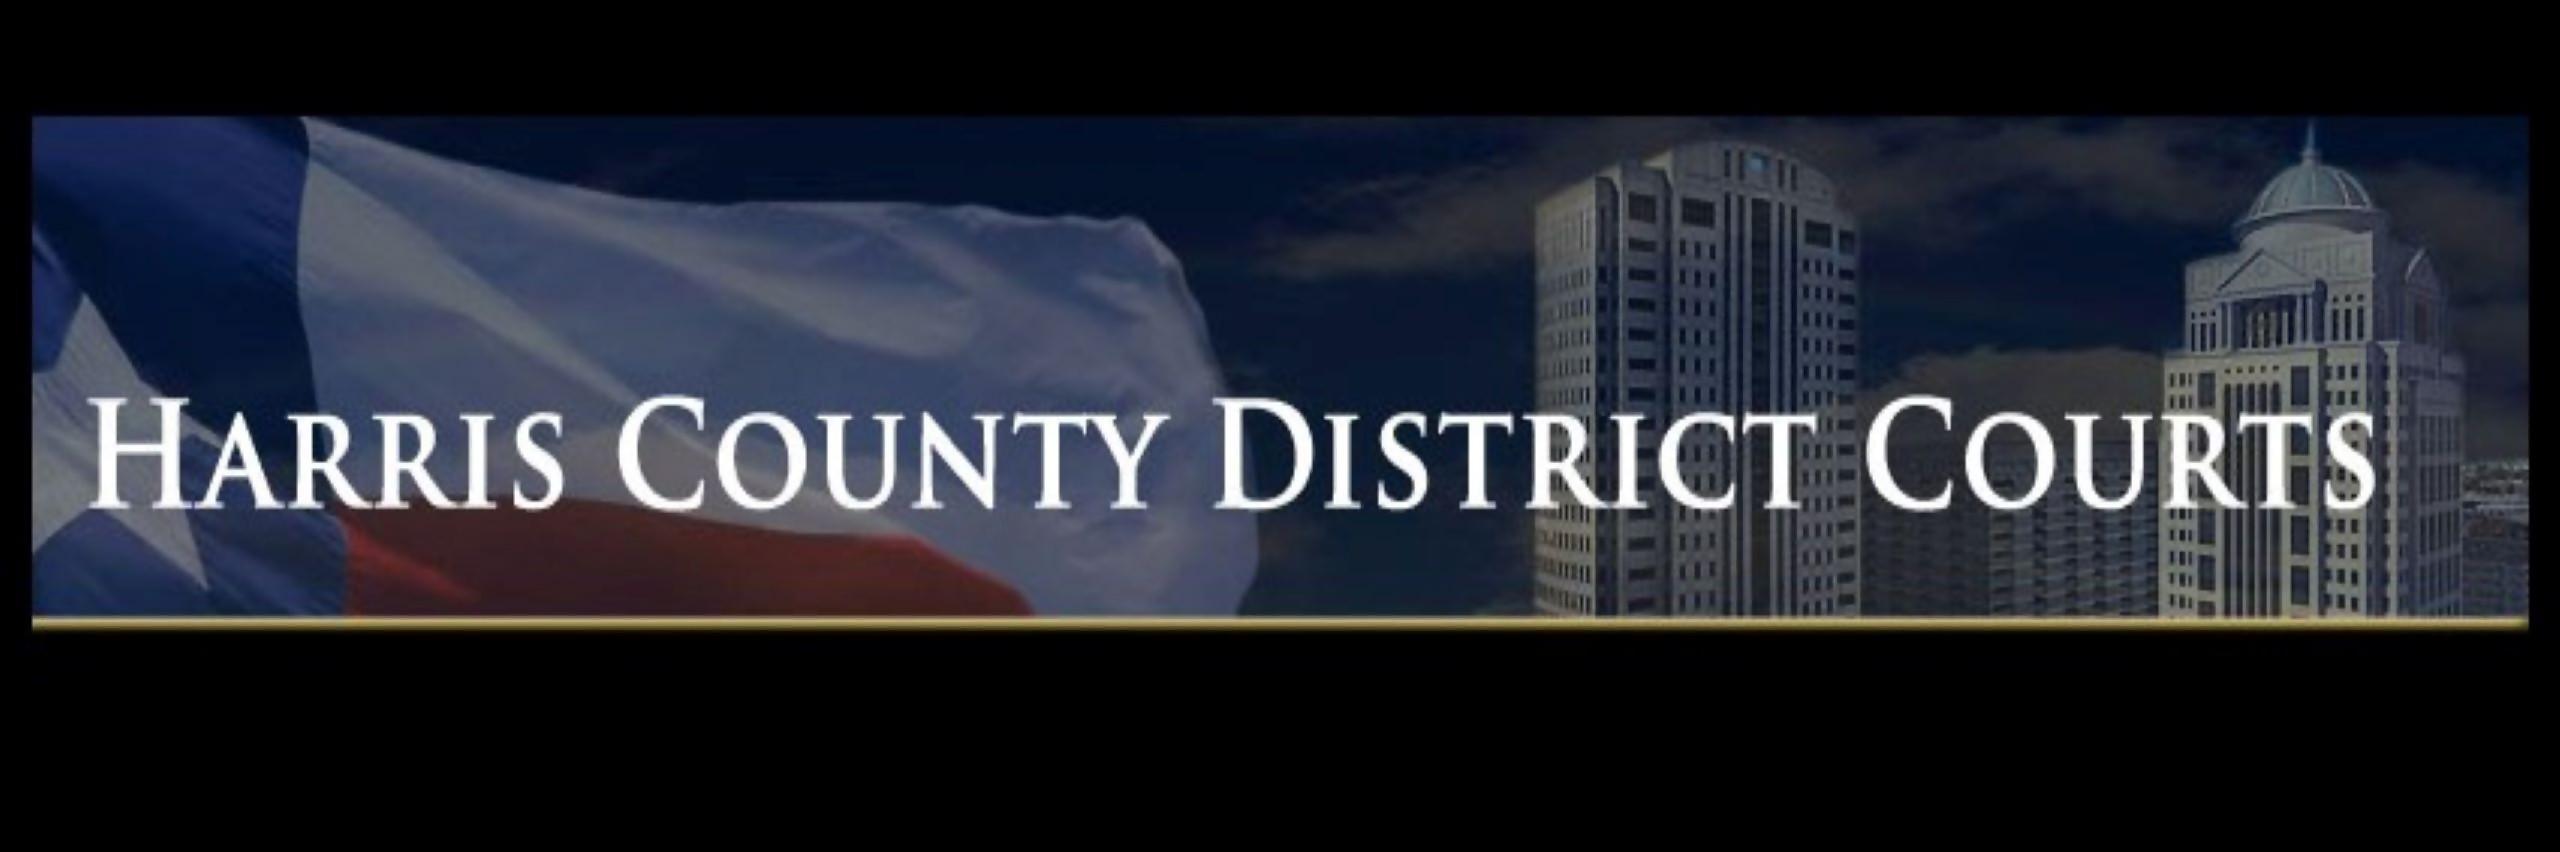 281st District Court - Live Stream